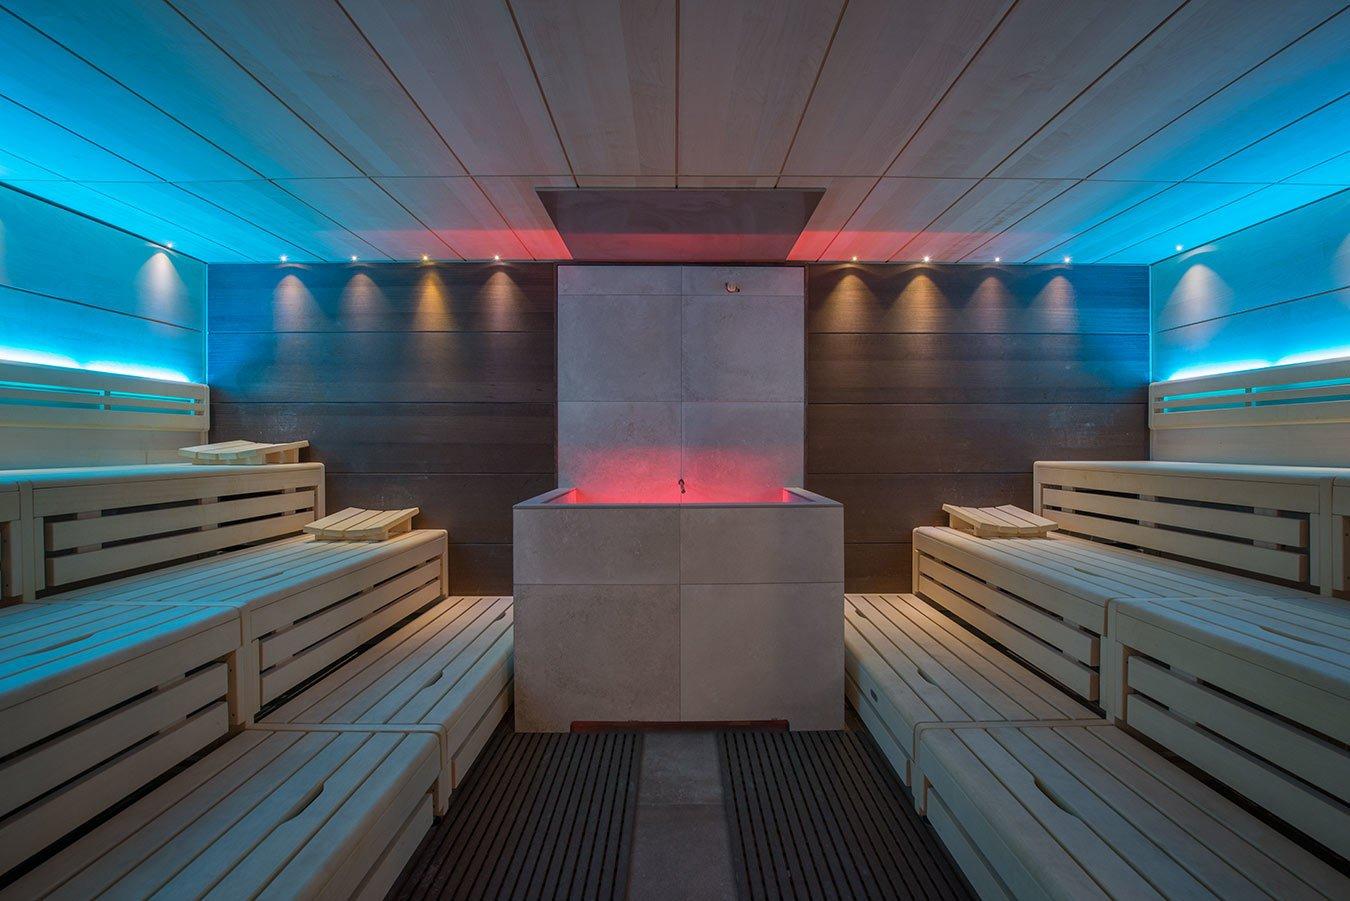 Fkk Sharks - Maison close Darmstadt - Sauna club - Bordel